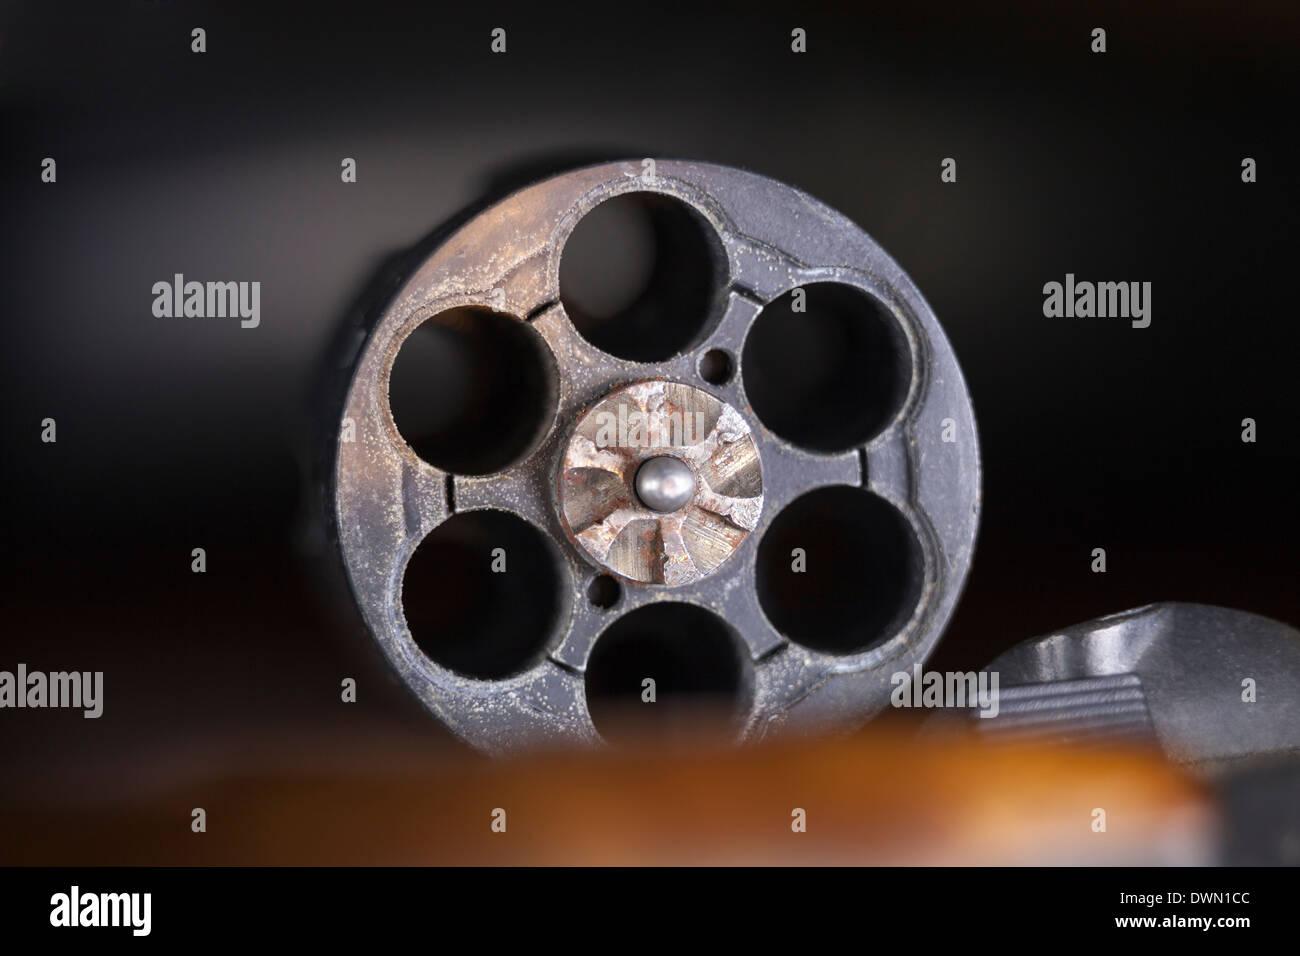 Macro of cylinder revolver handgun. - Stock Image